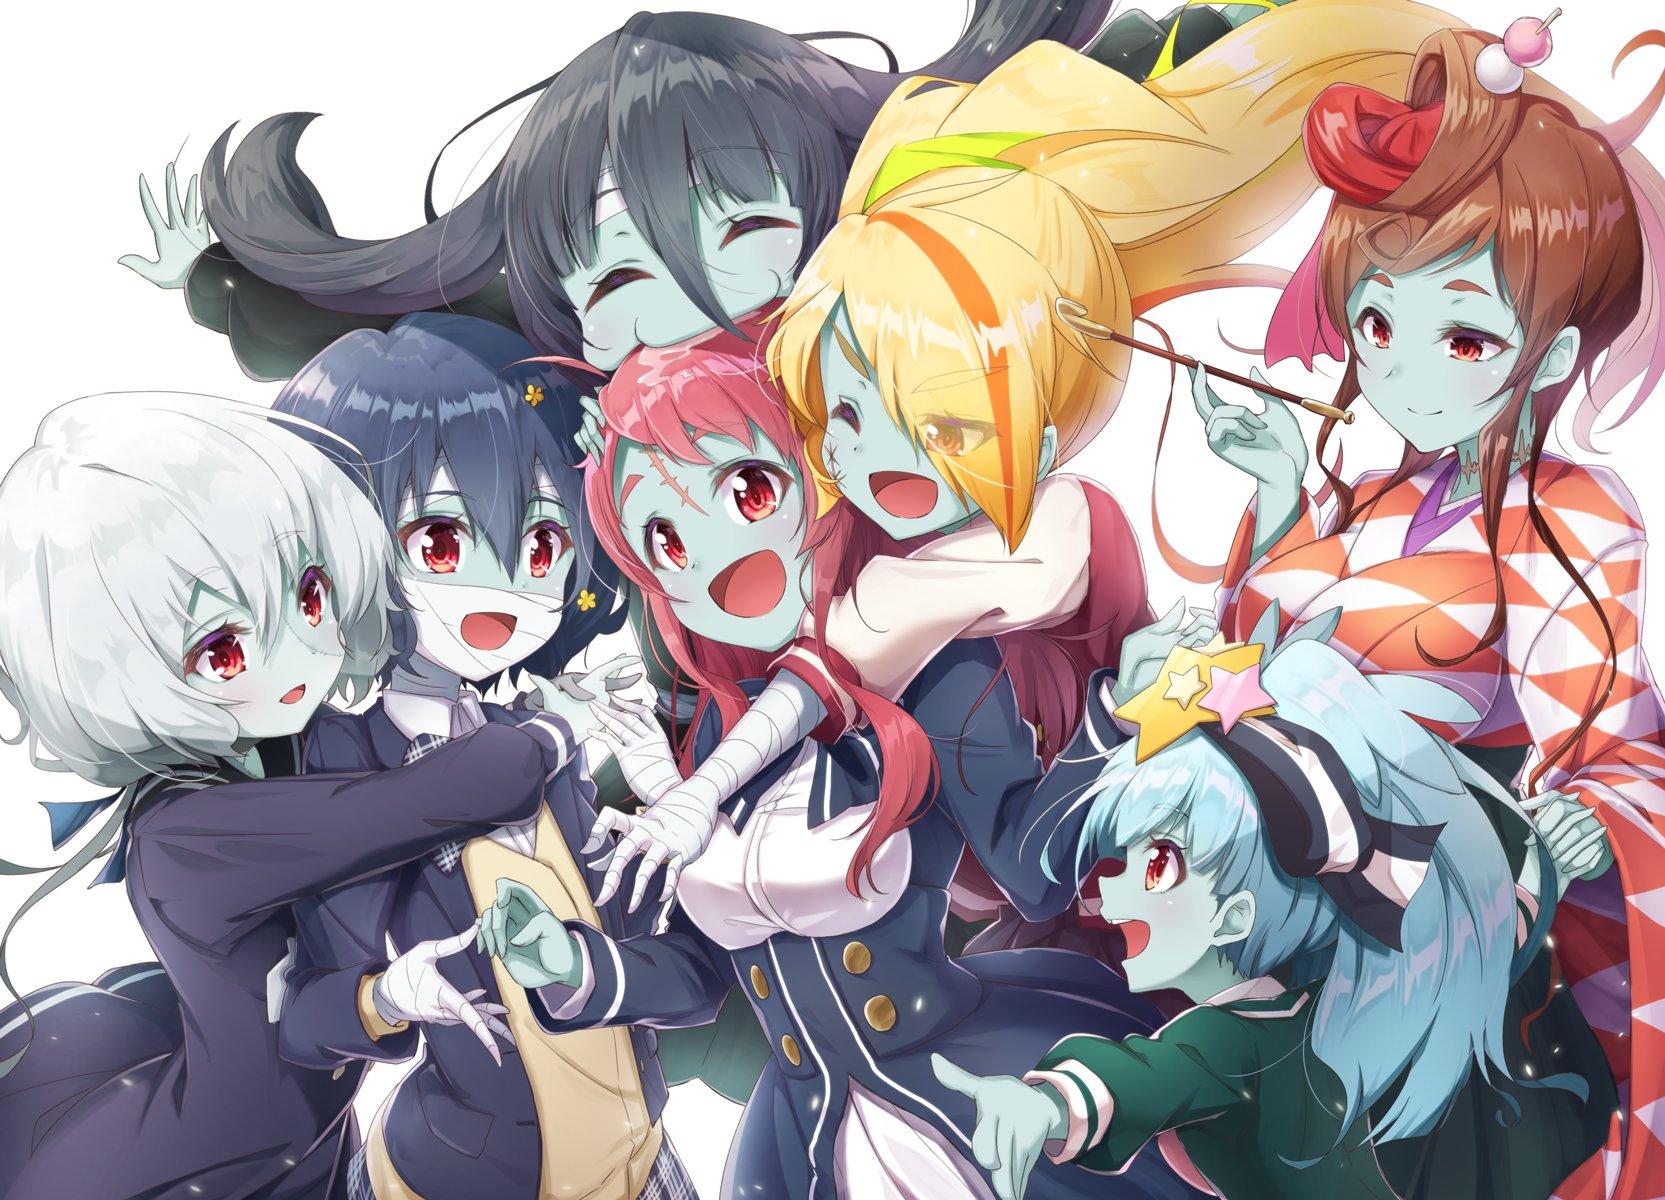 Zombieland Saga Anime Girls Zombie 0 Tae Yamada Zombie 1 Sakura Minamoto Zombie 2 Saki Nikaidou Zomb Wallpaper Resolution 1665x1200 Id 352433 Wallha Com